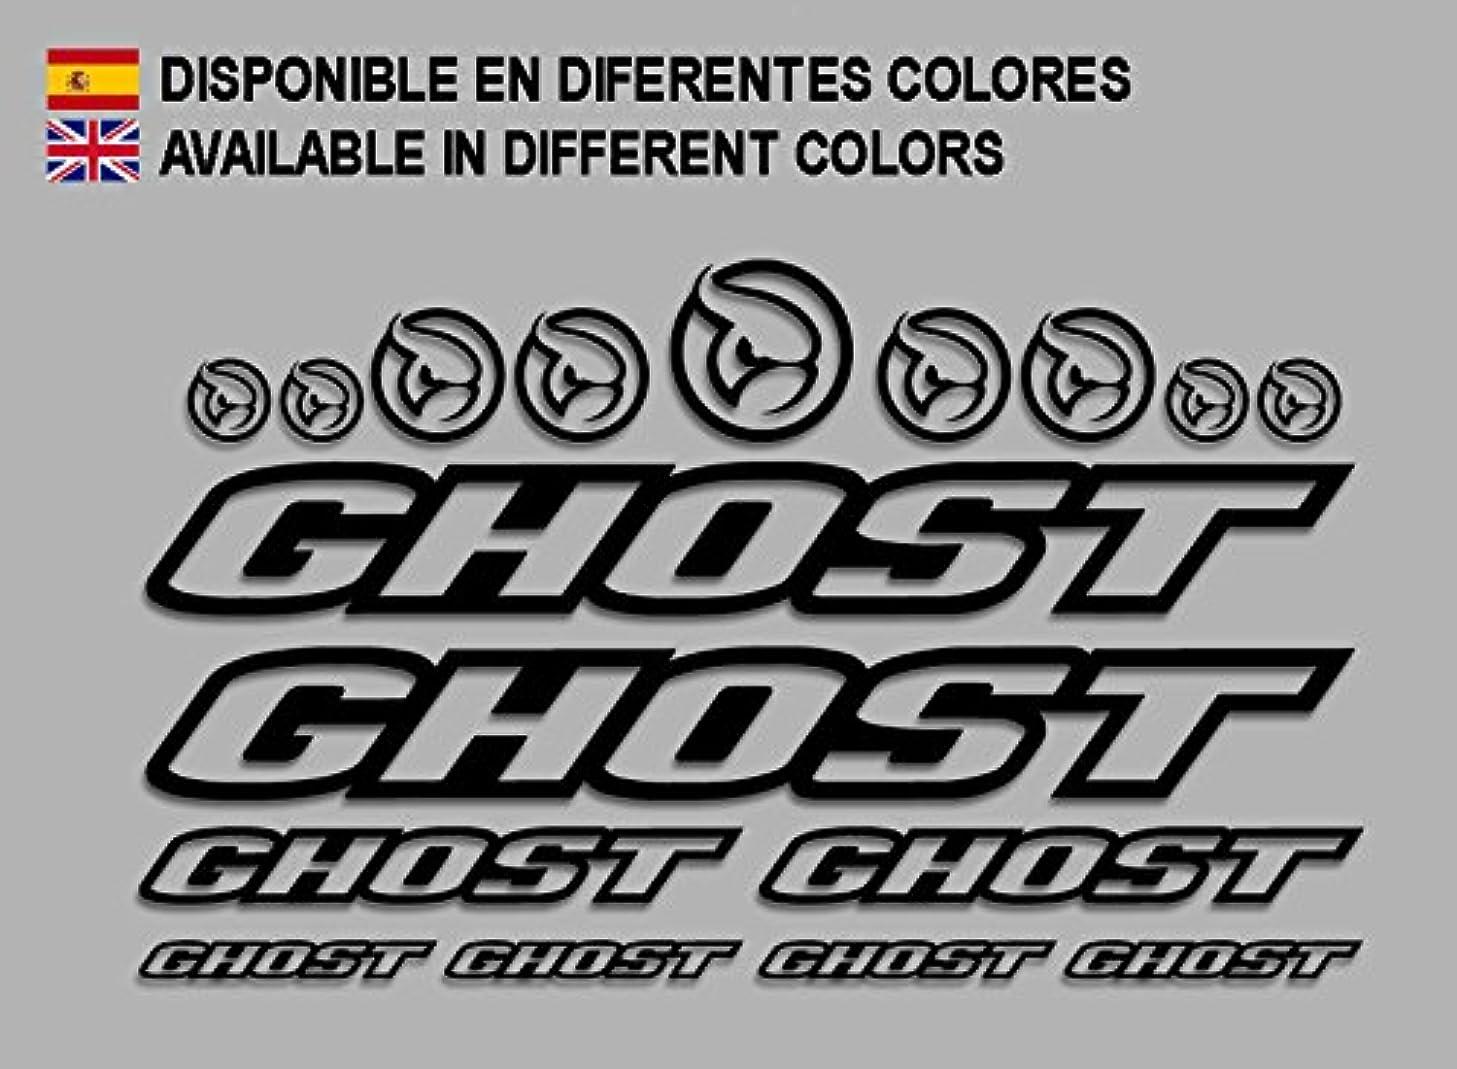 Ecoshirt 8K-8CIA-WFY1 Stickers Ghost F188 Vinyl Adesivi Decal Aufkleber ΔΟ MTB Stickers Bike, Black